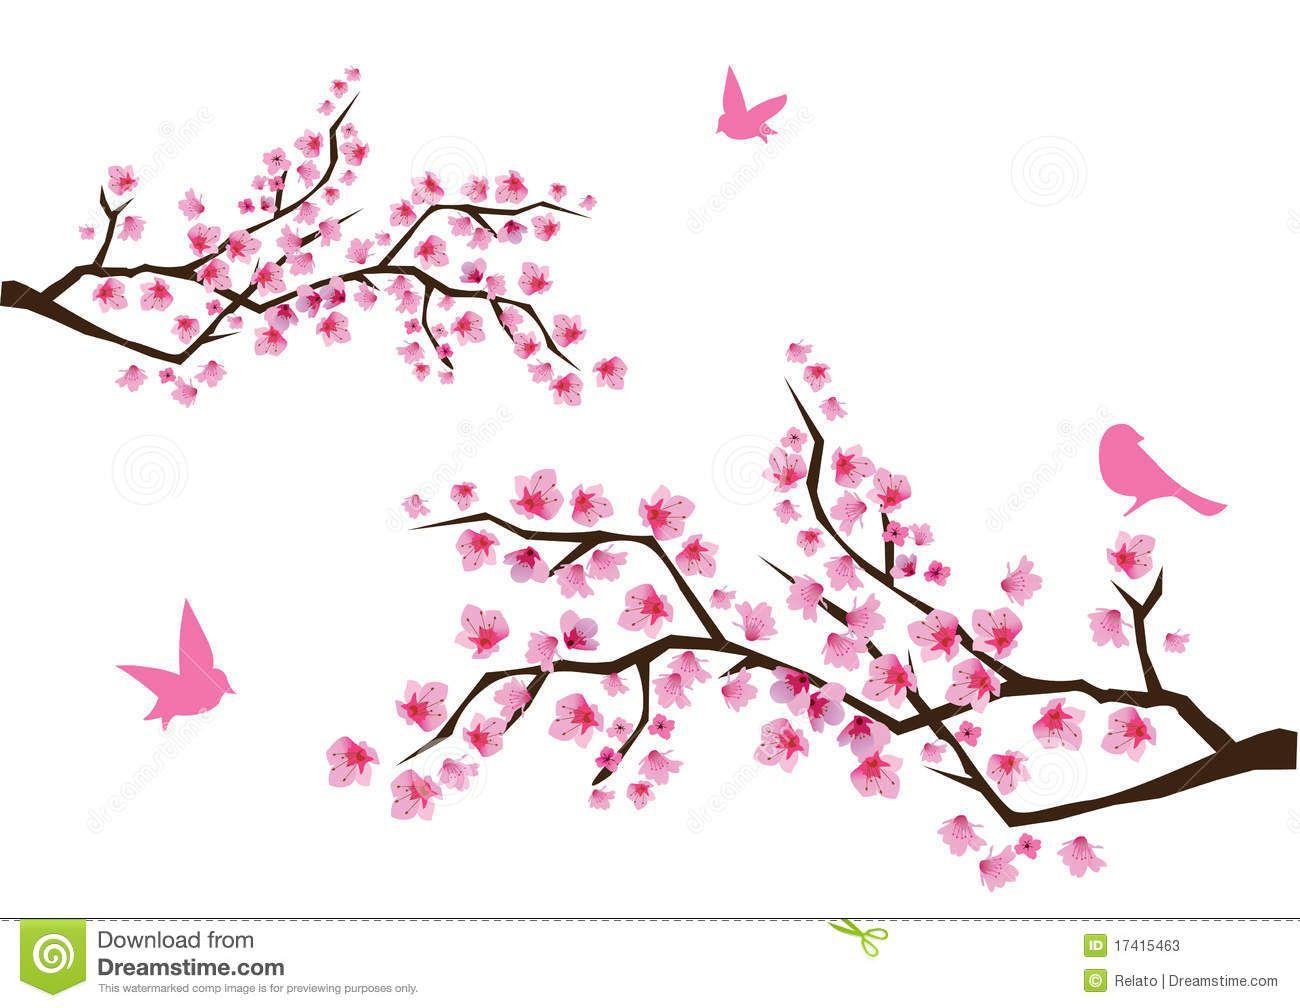 Cherry Blossom 17415463 Jpg 1300 1008 Pixels Cherry Blossom Drawing Cherry Blossom Art Willow Tree Art